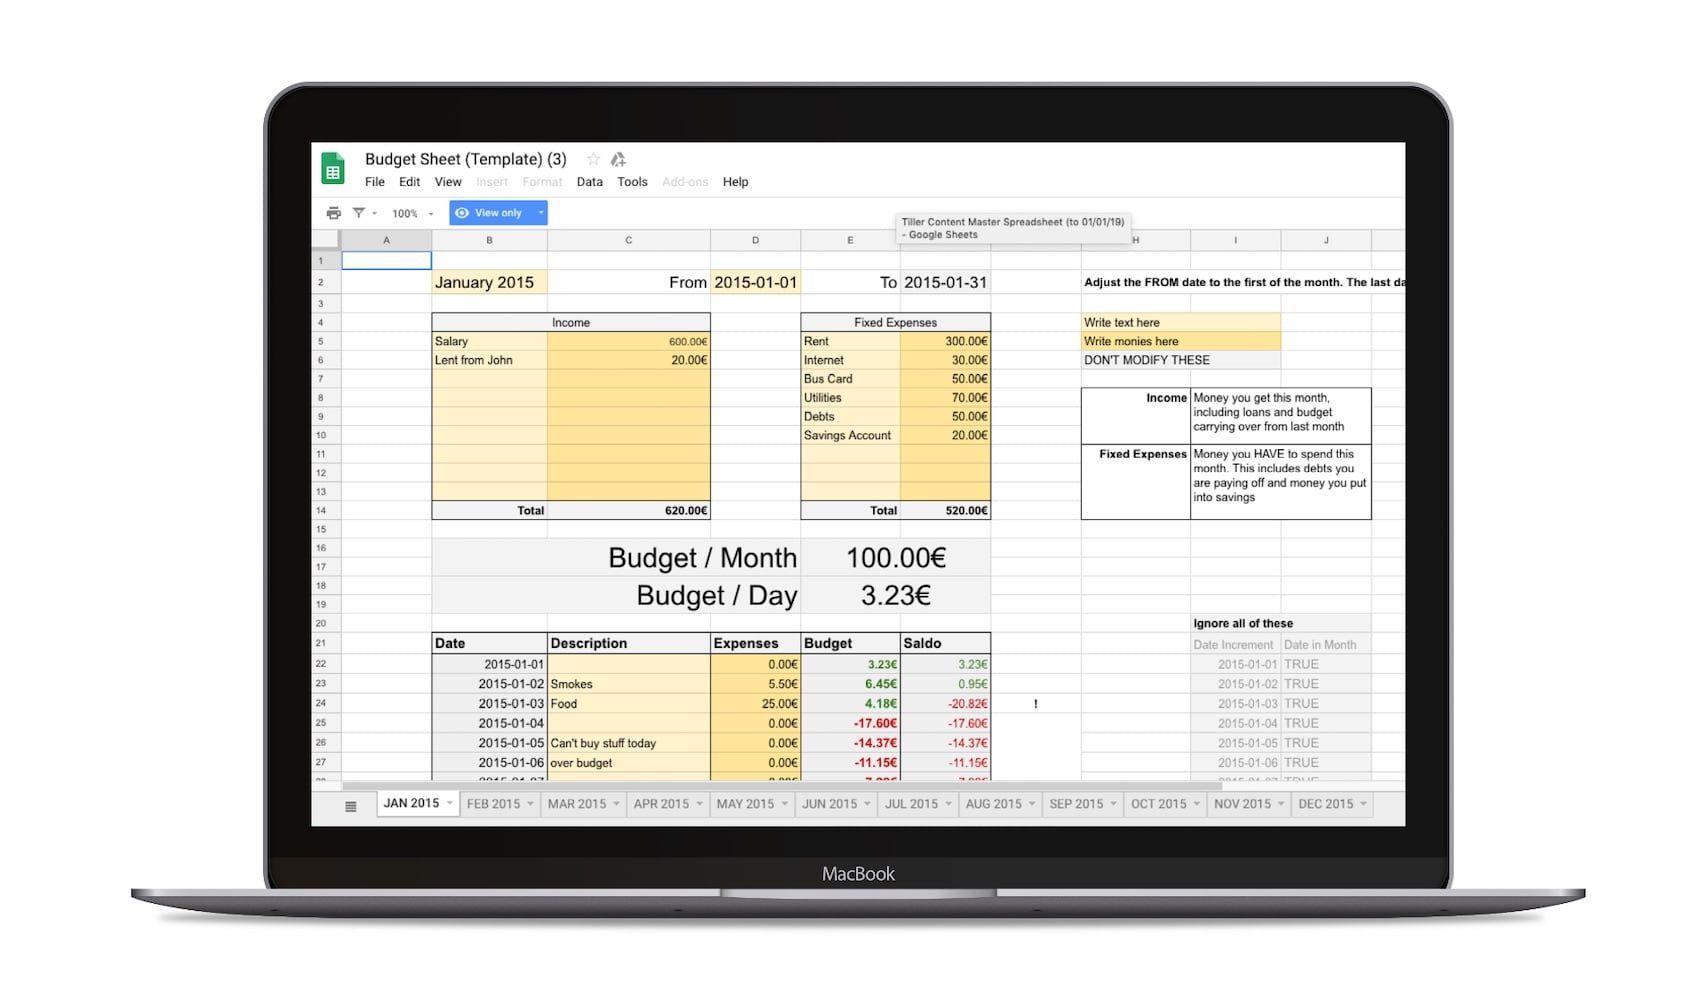 008 Best Personal Budget Sheet Template Uk Image  SpreadsheetFull